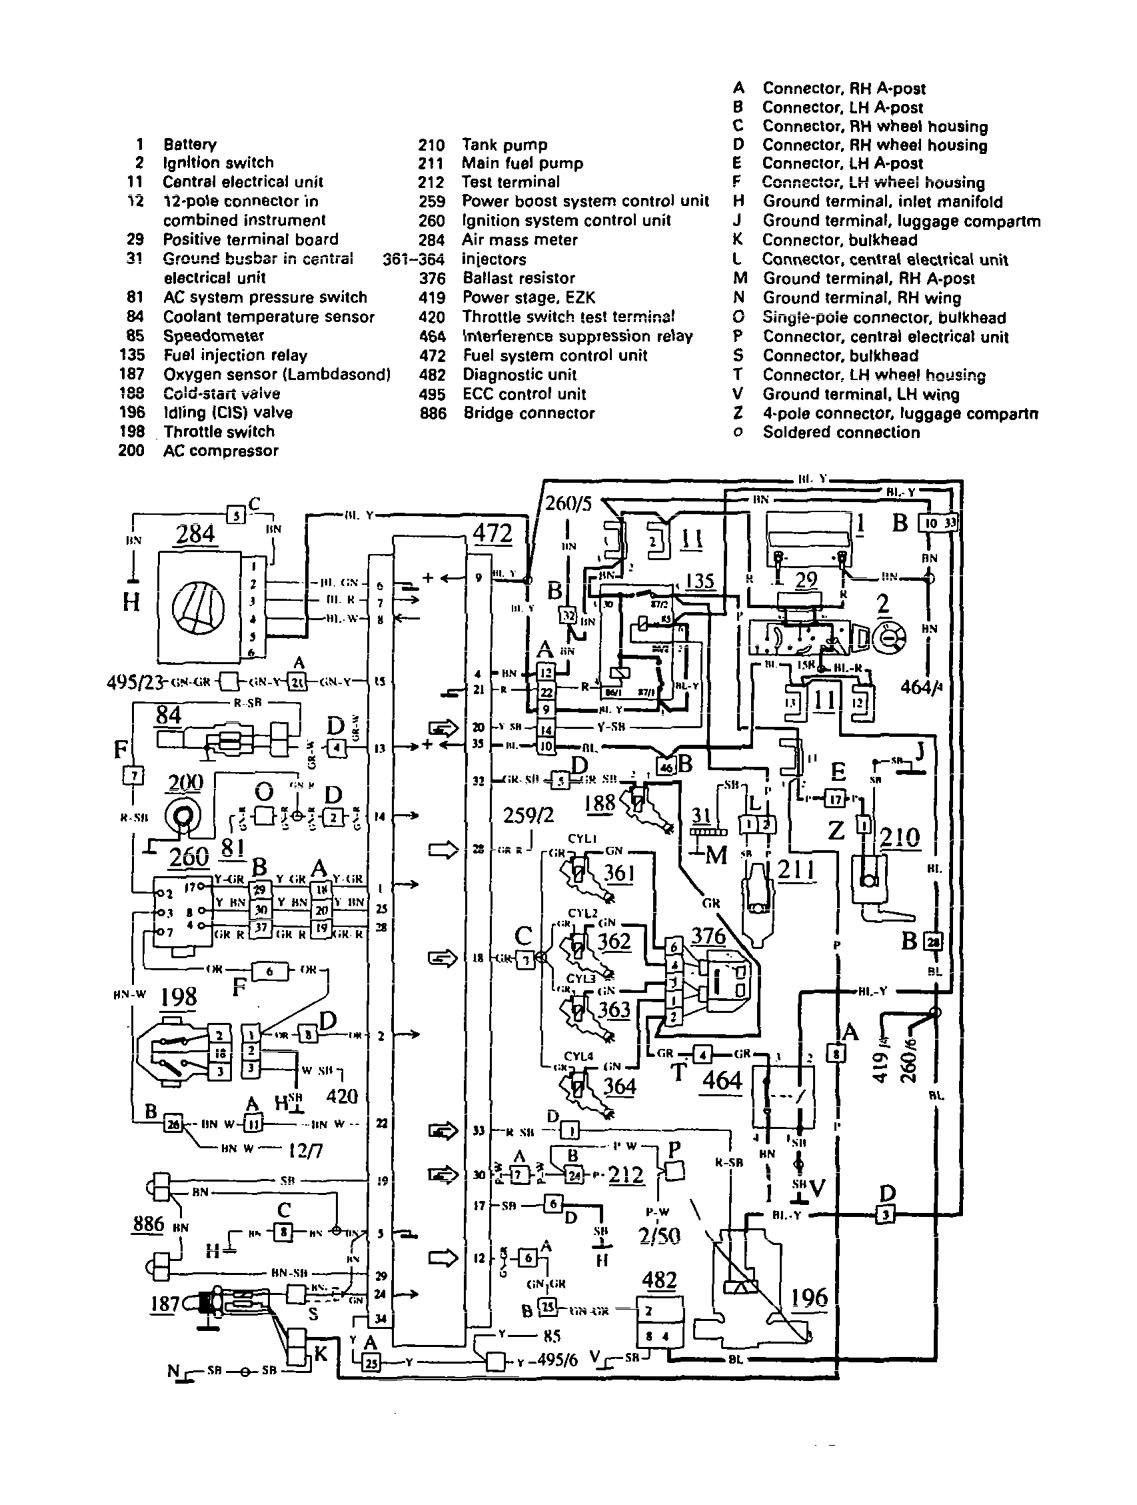 1998 bluebird bus wiring diagram automotive software free diagrams auto